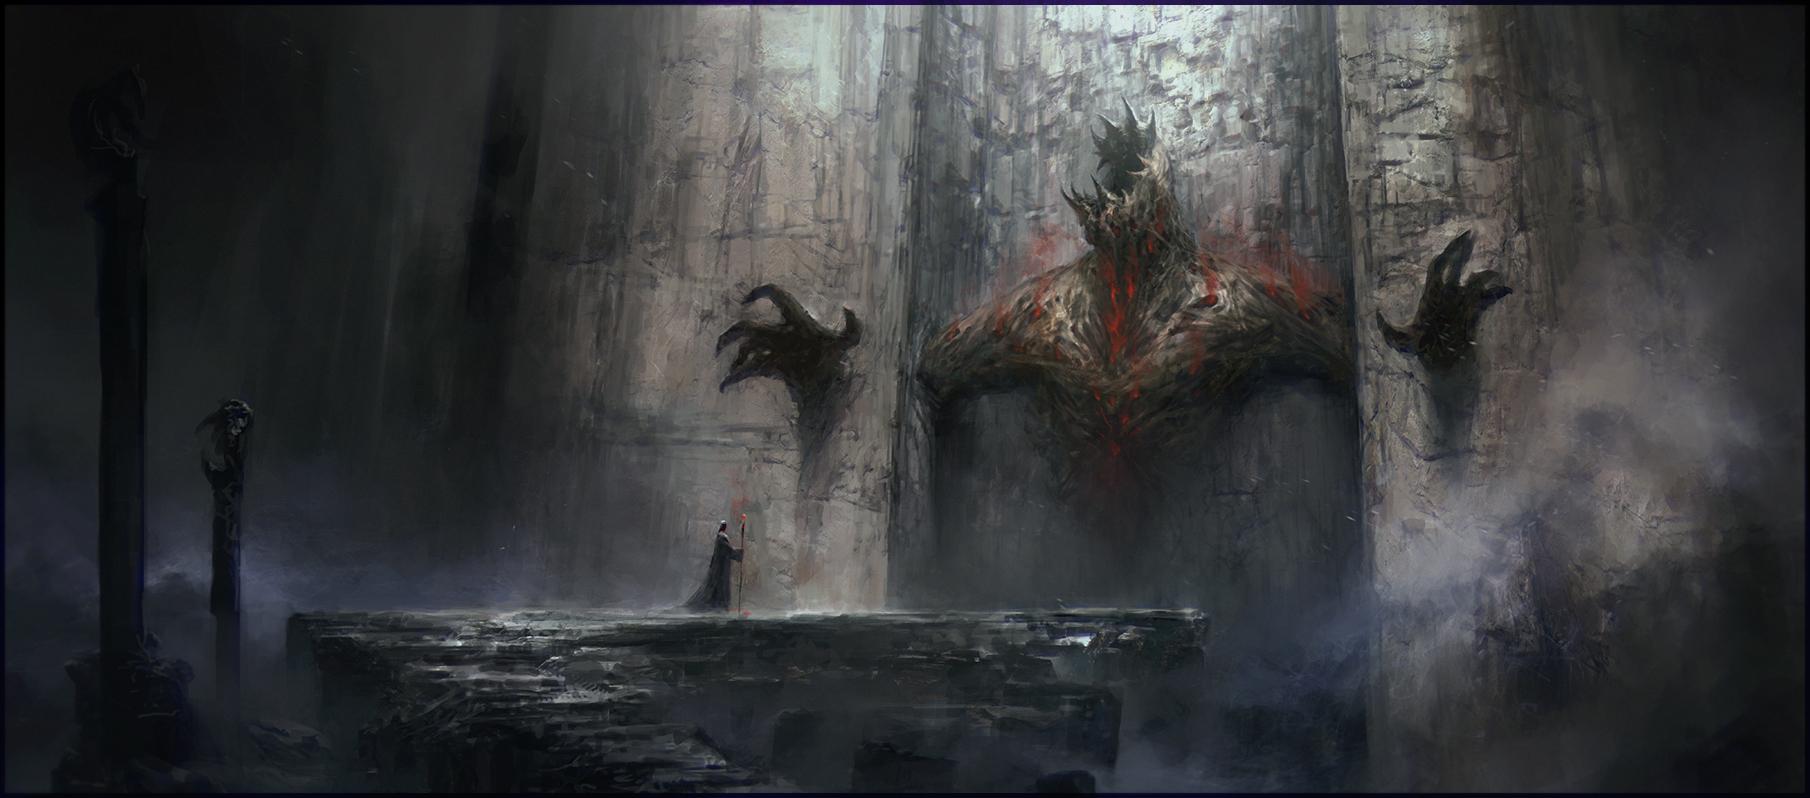 https://orig00.deviantart.net/a44f/f/2018/202/6/8/stone_prison_by_chriscold-dchuq5v.jpg